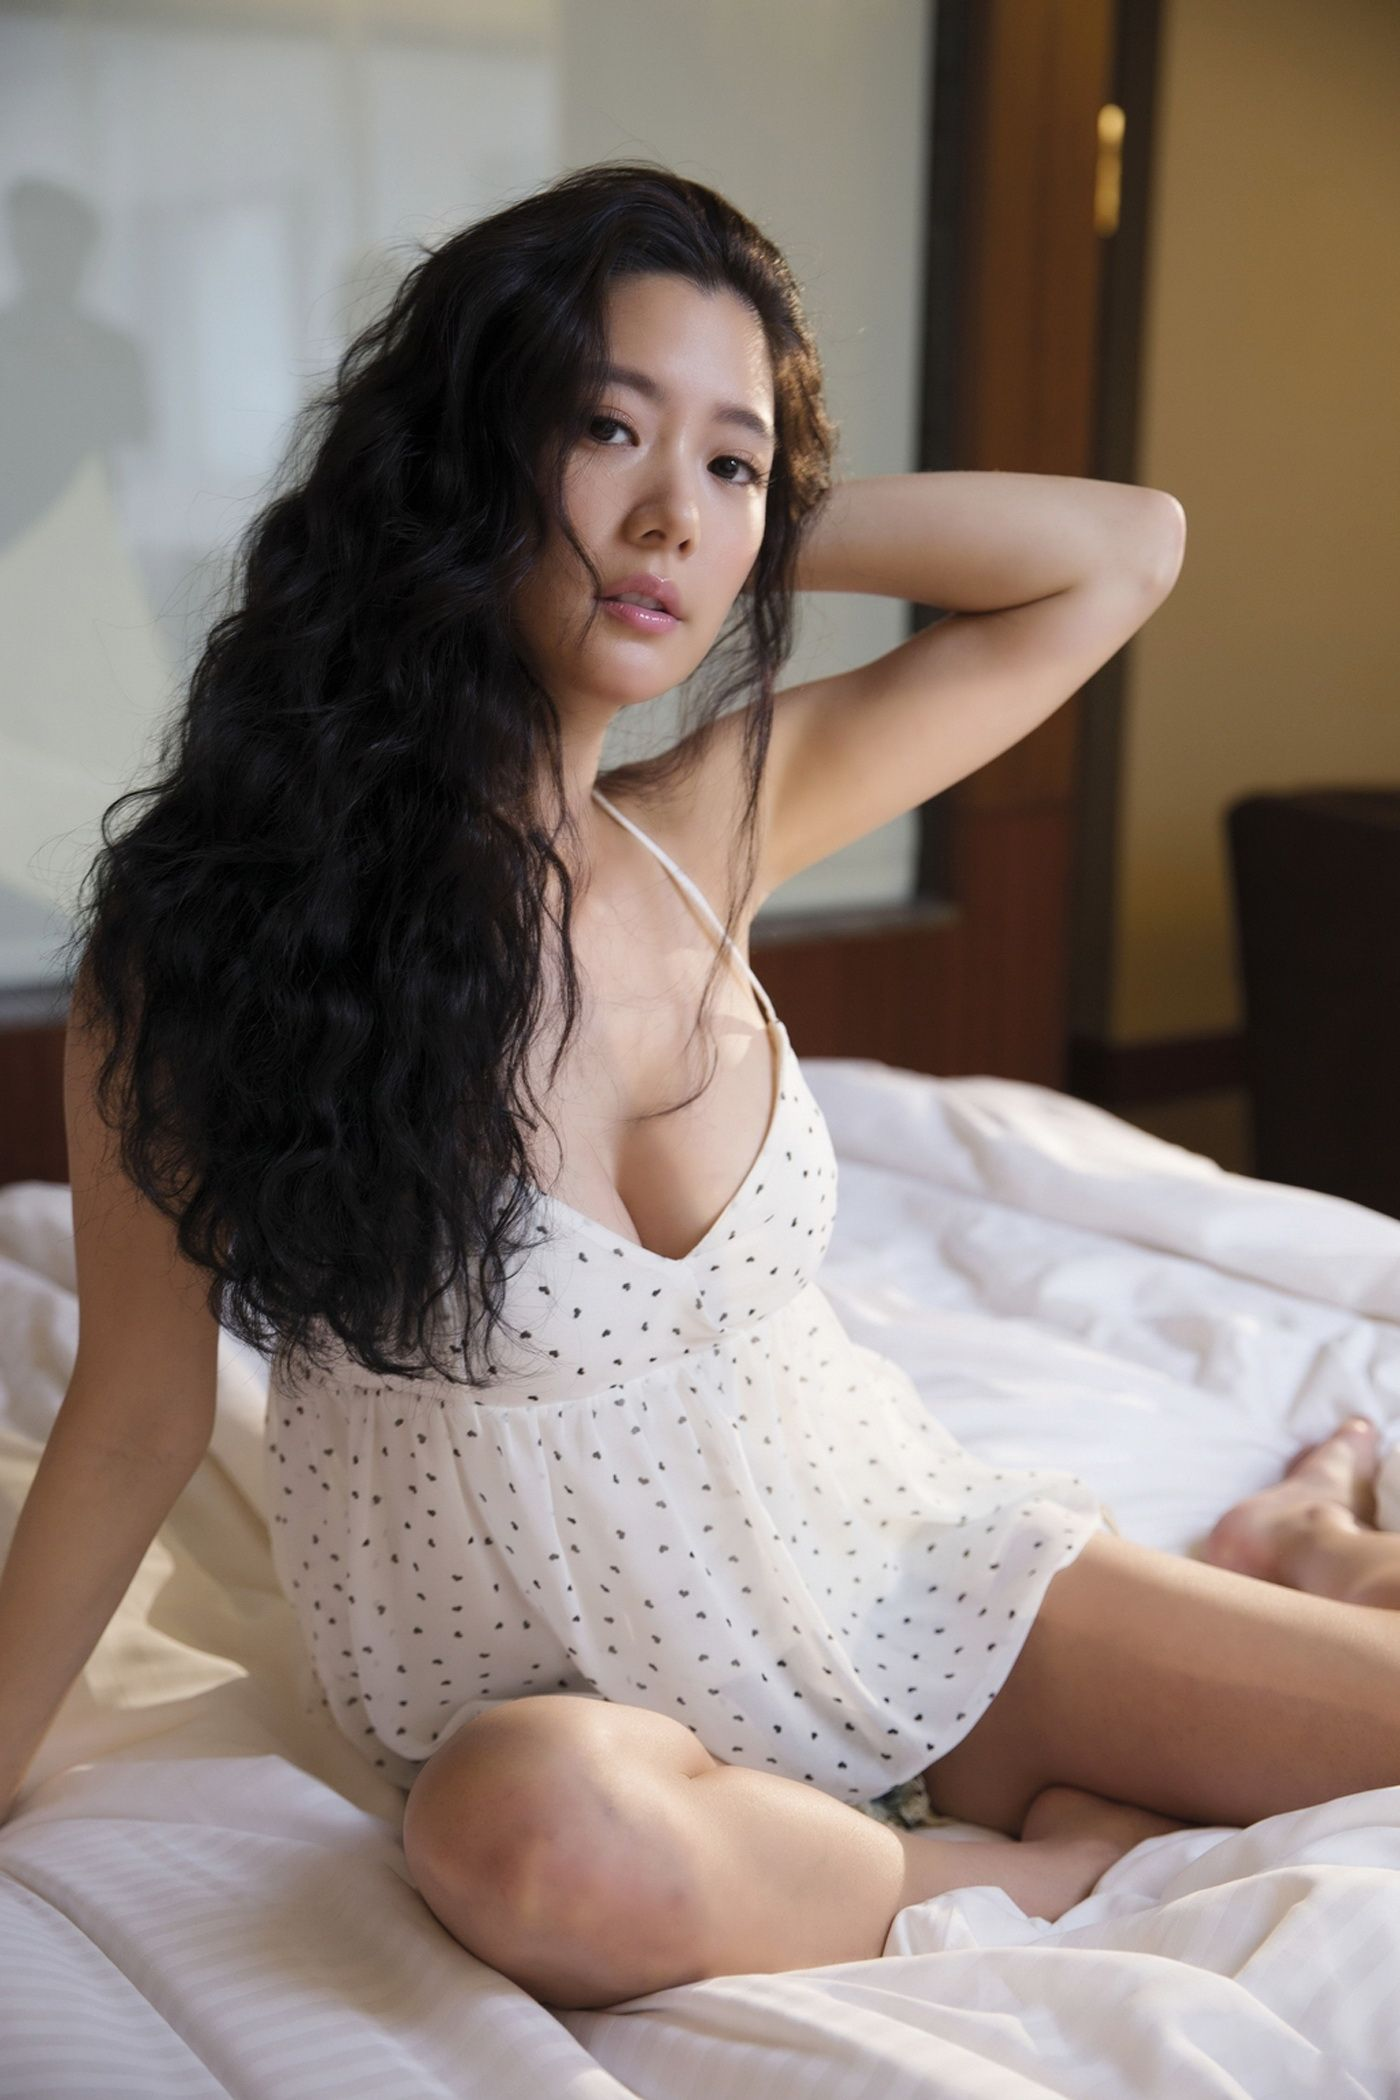 clara李成敏 instagra 图片合集